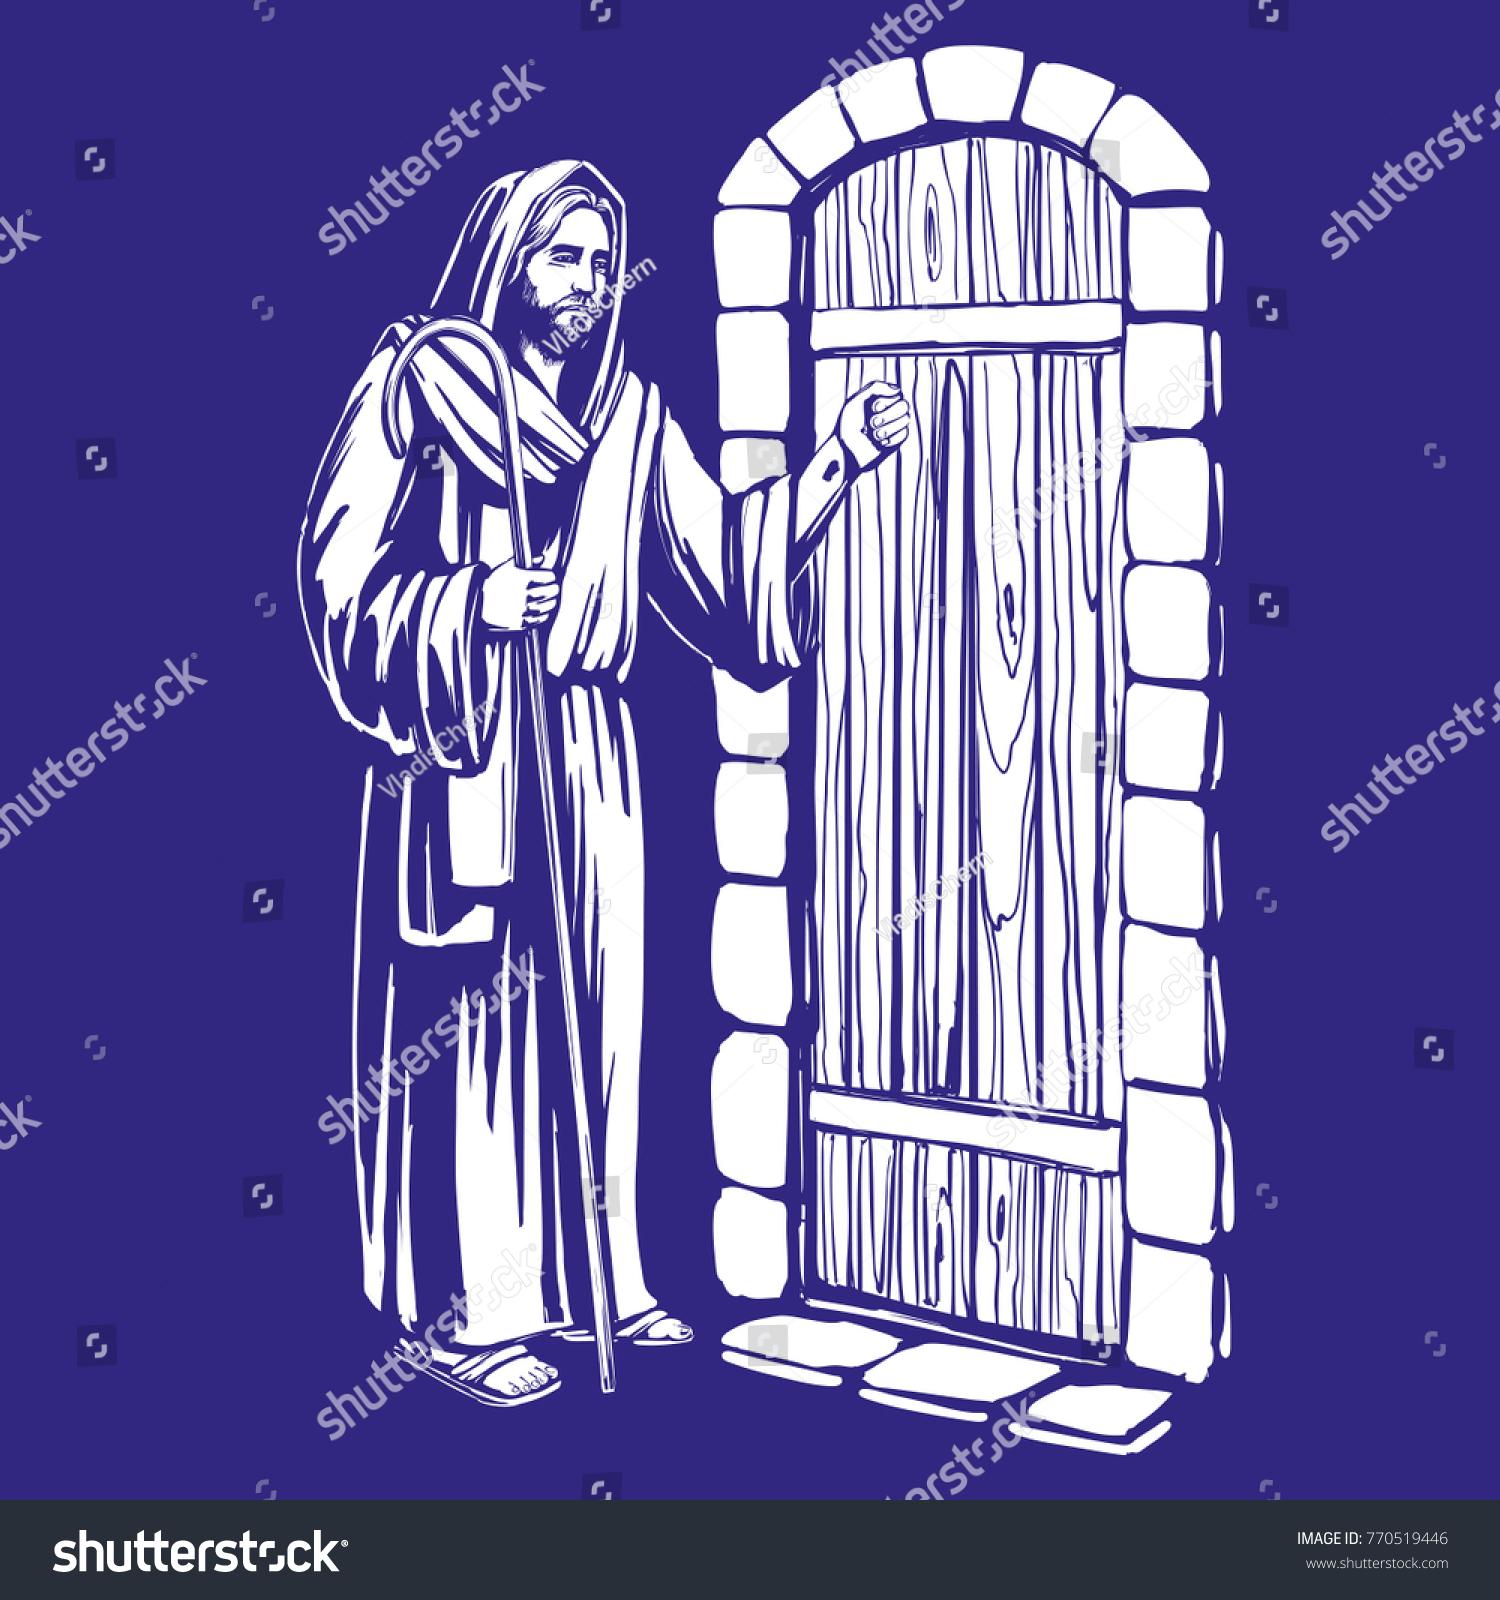 Jesus christ son god knocking door stock vector royalty free jesus christ son of god knocking at the door symbol of christianity hand drawn altavistaventures Gallery